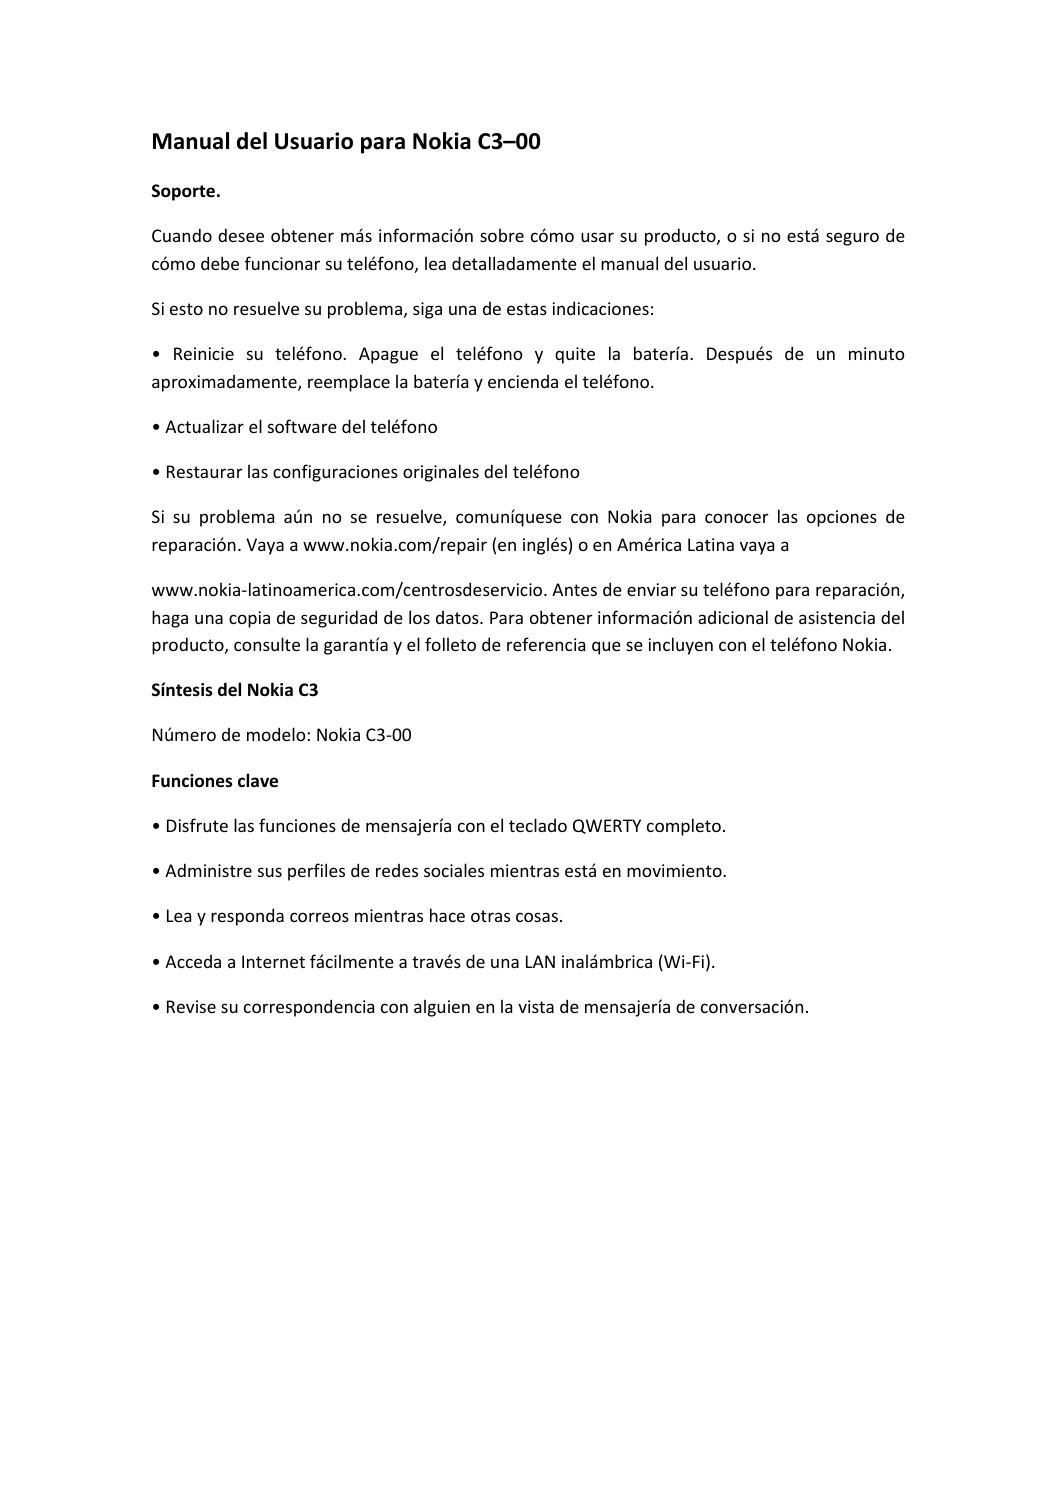 manual del usuario para nokia c3 by carolina galvis issuu rh issuu com Nokia C5 Nokia E71